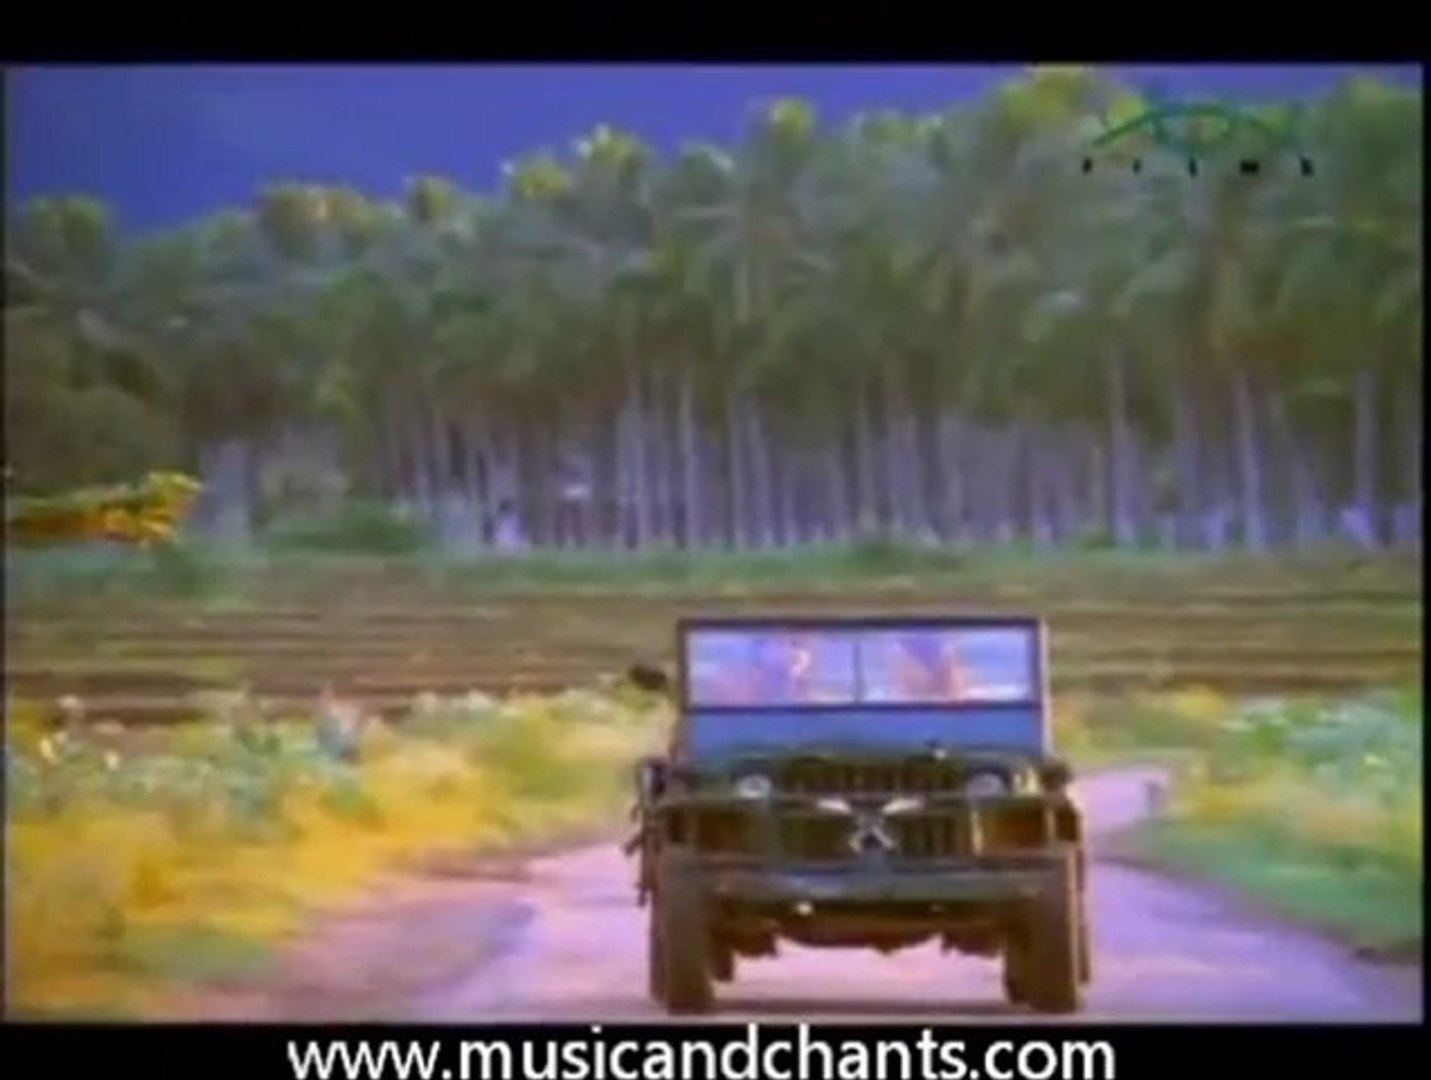 valparai vattaparai mp4 video song free download